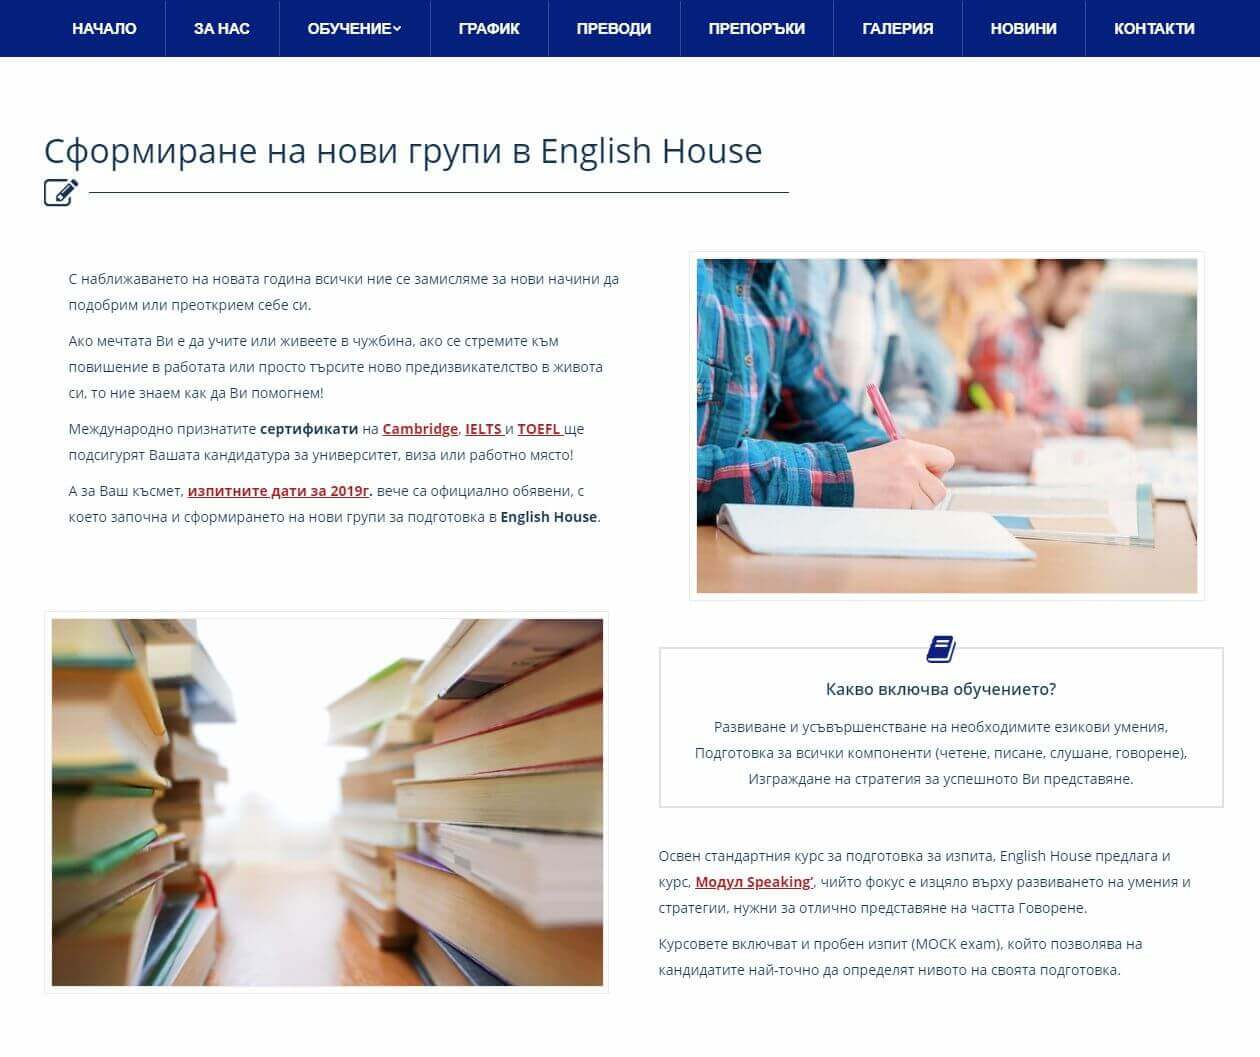 SEO optimization and designing websites - Media Design